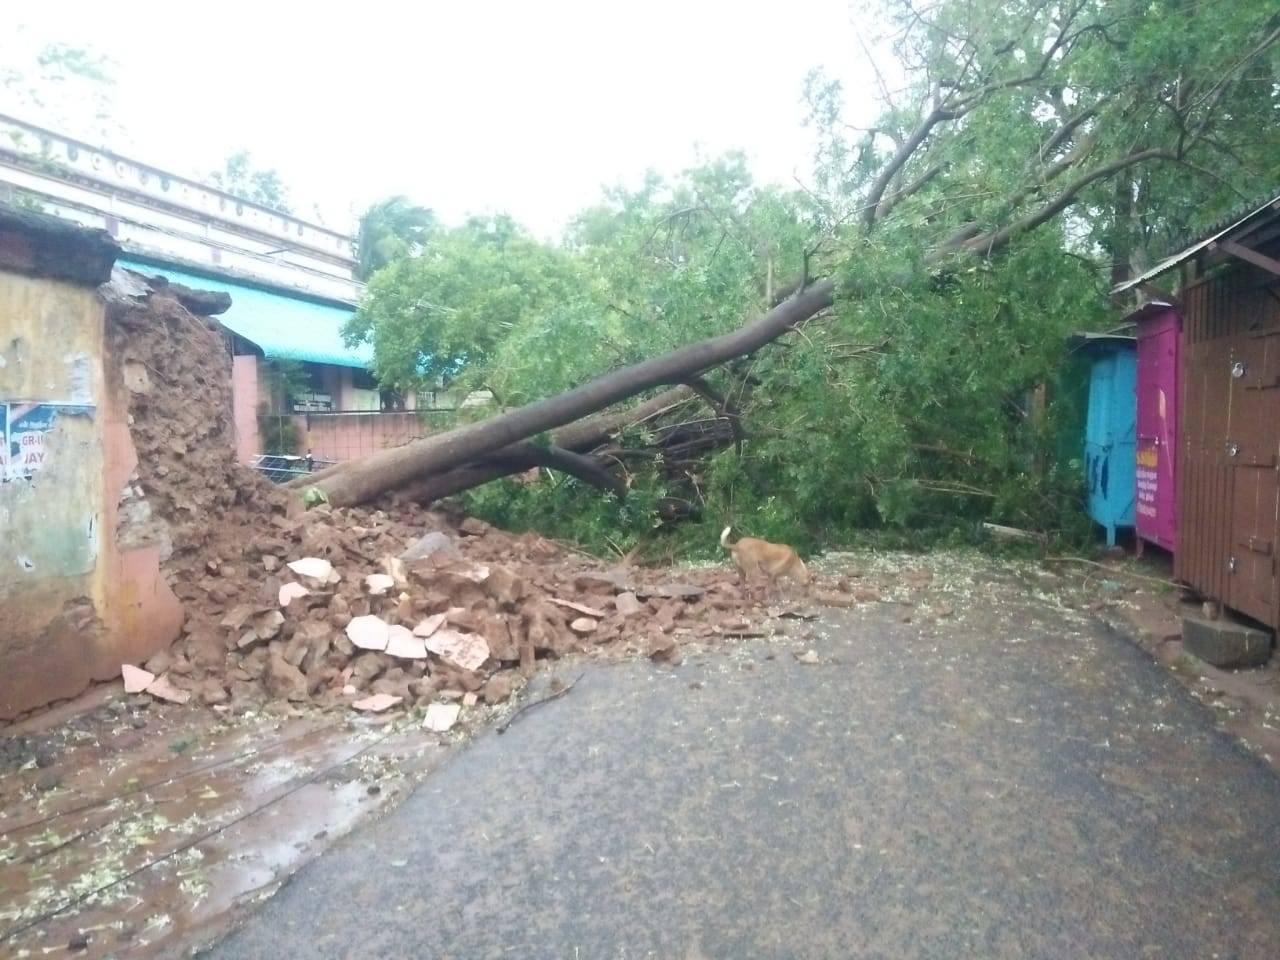 Cyclone Gaja Chennai: Gaja cyclone wreaks damage in Tamil Nadu